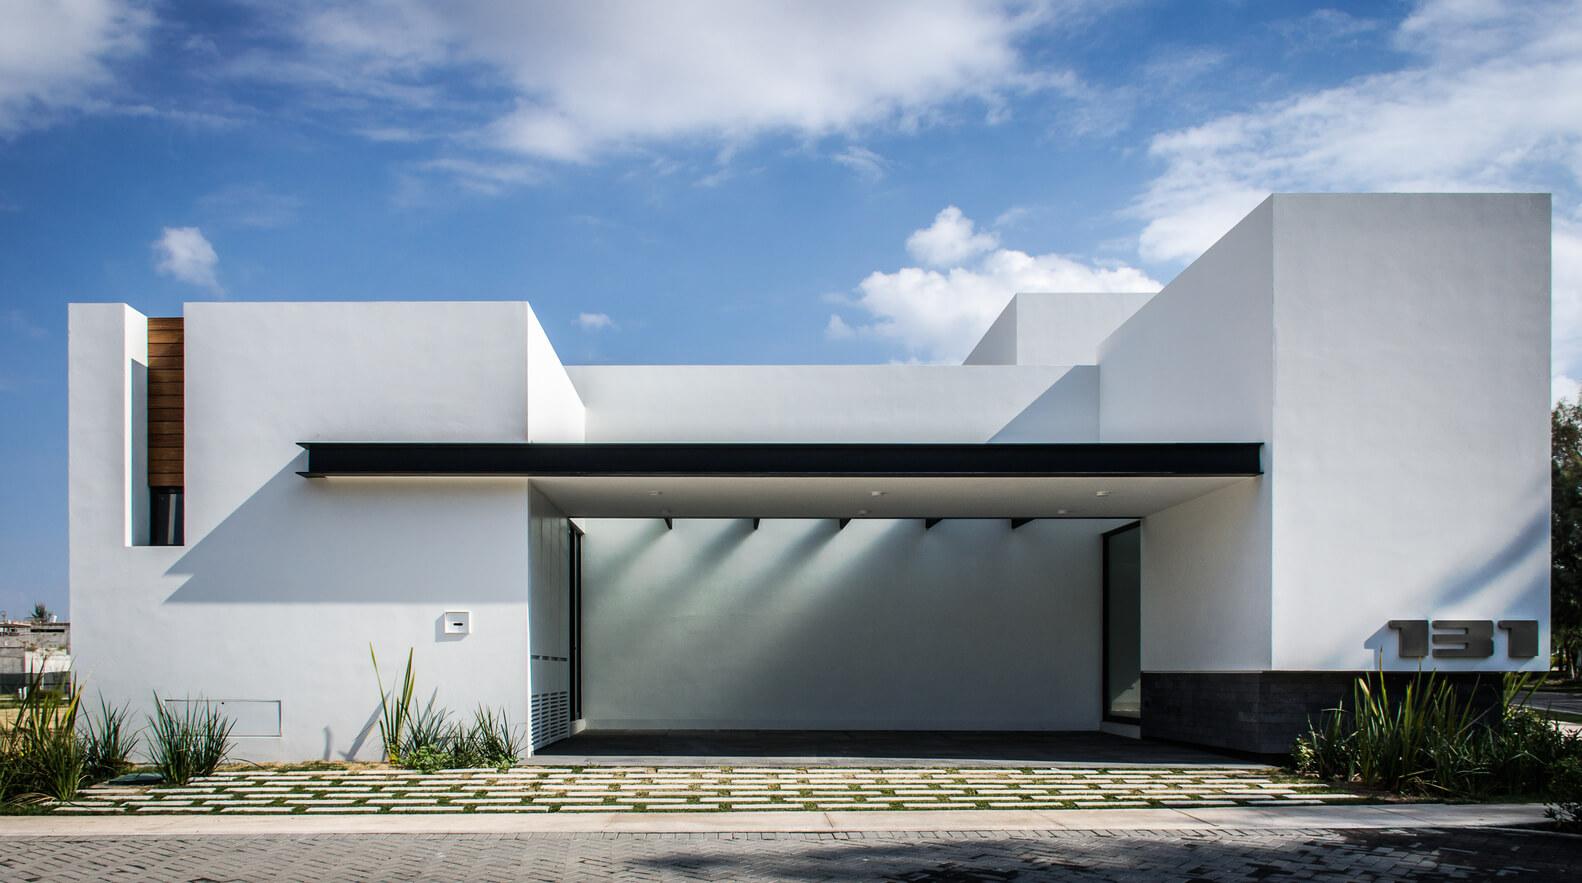 16 fachadas modernas diganas de imitar interiores for Diseno de fachadas minimalistas